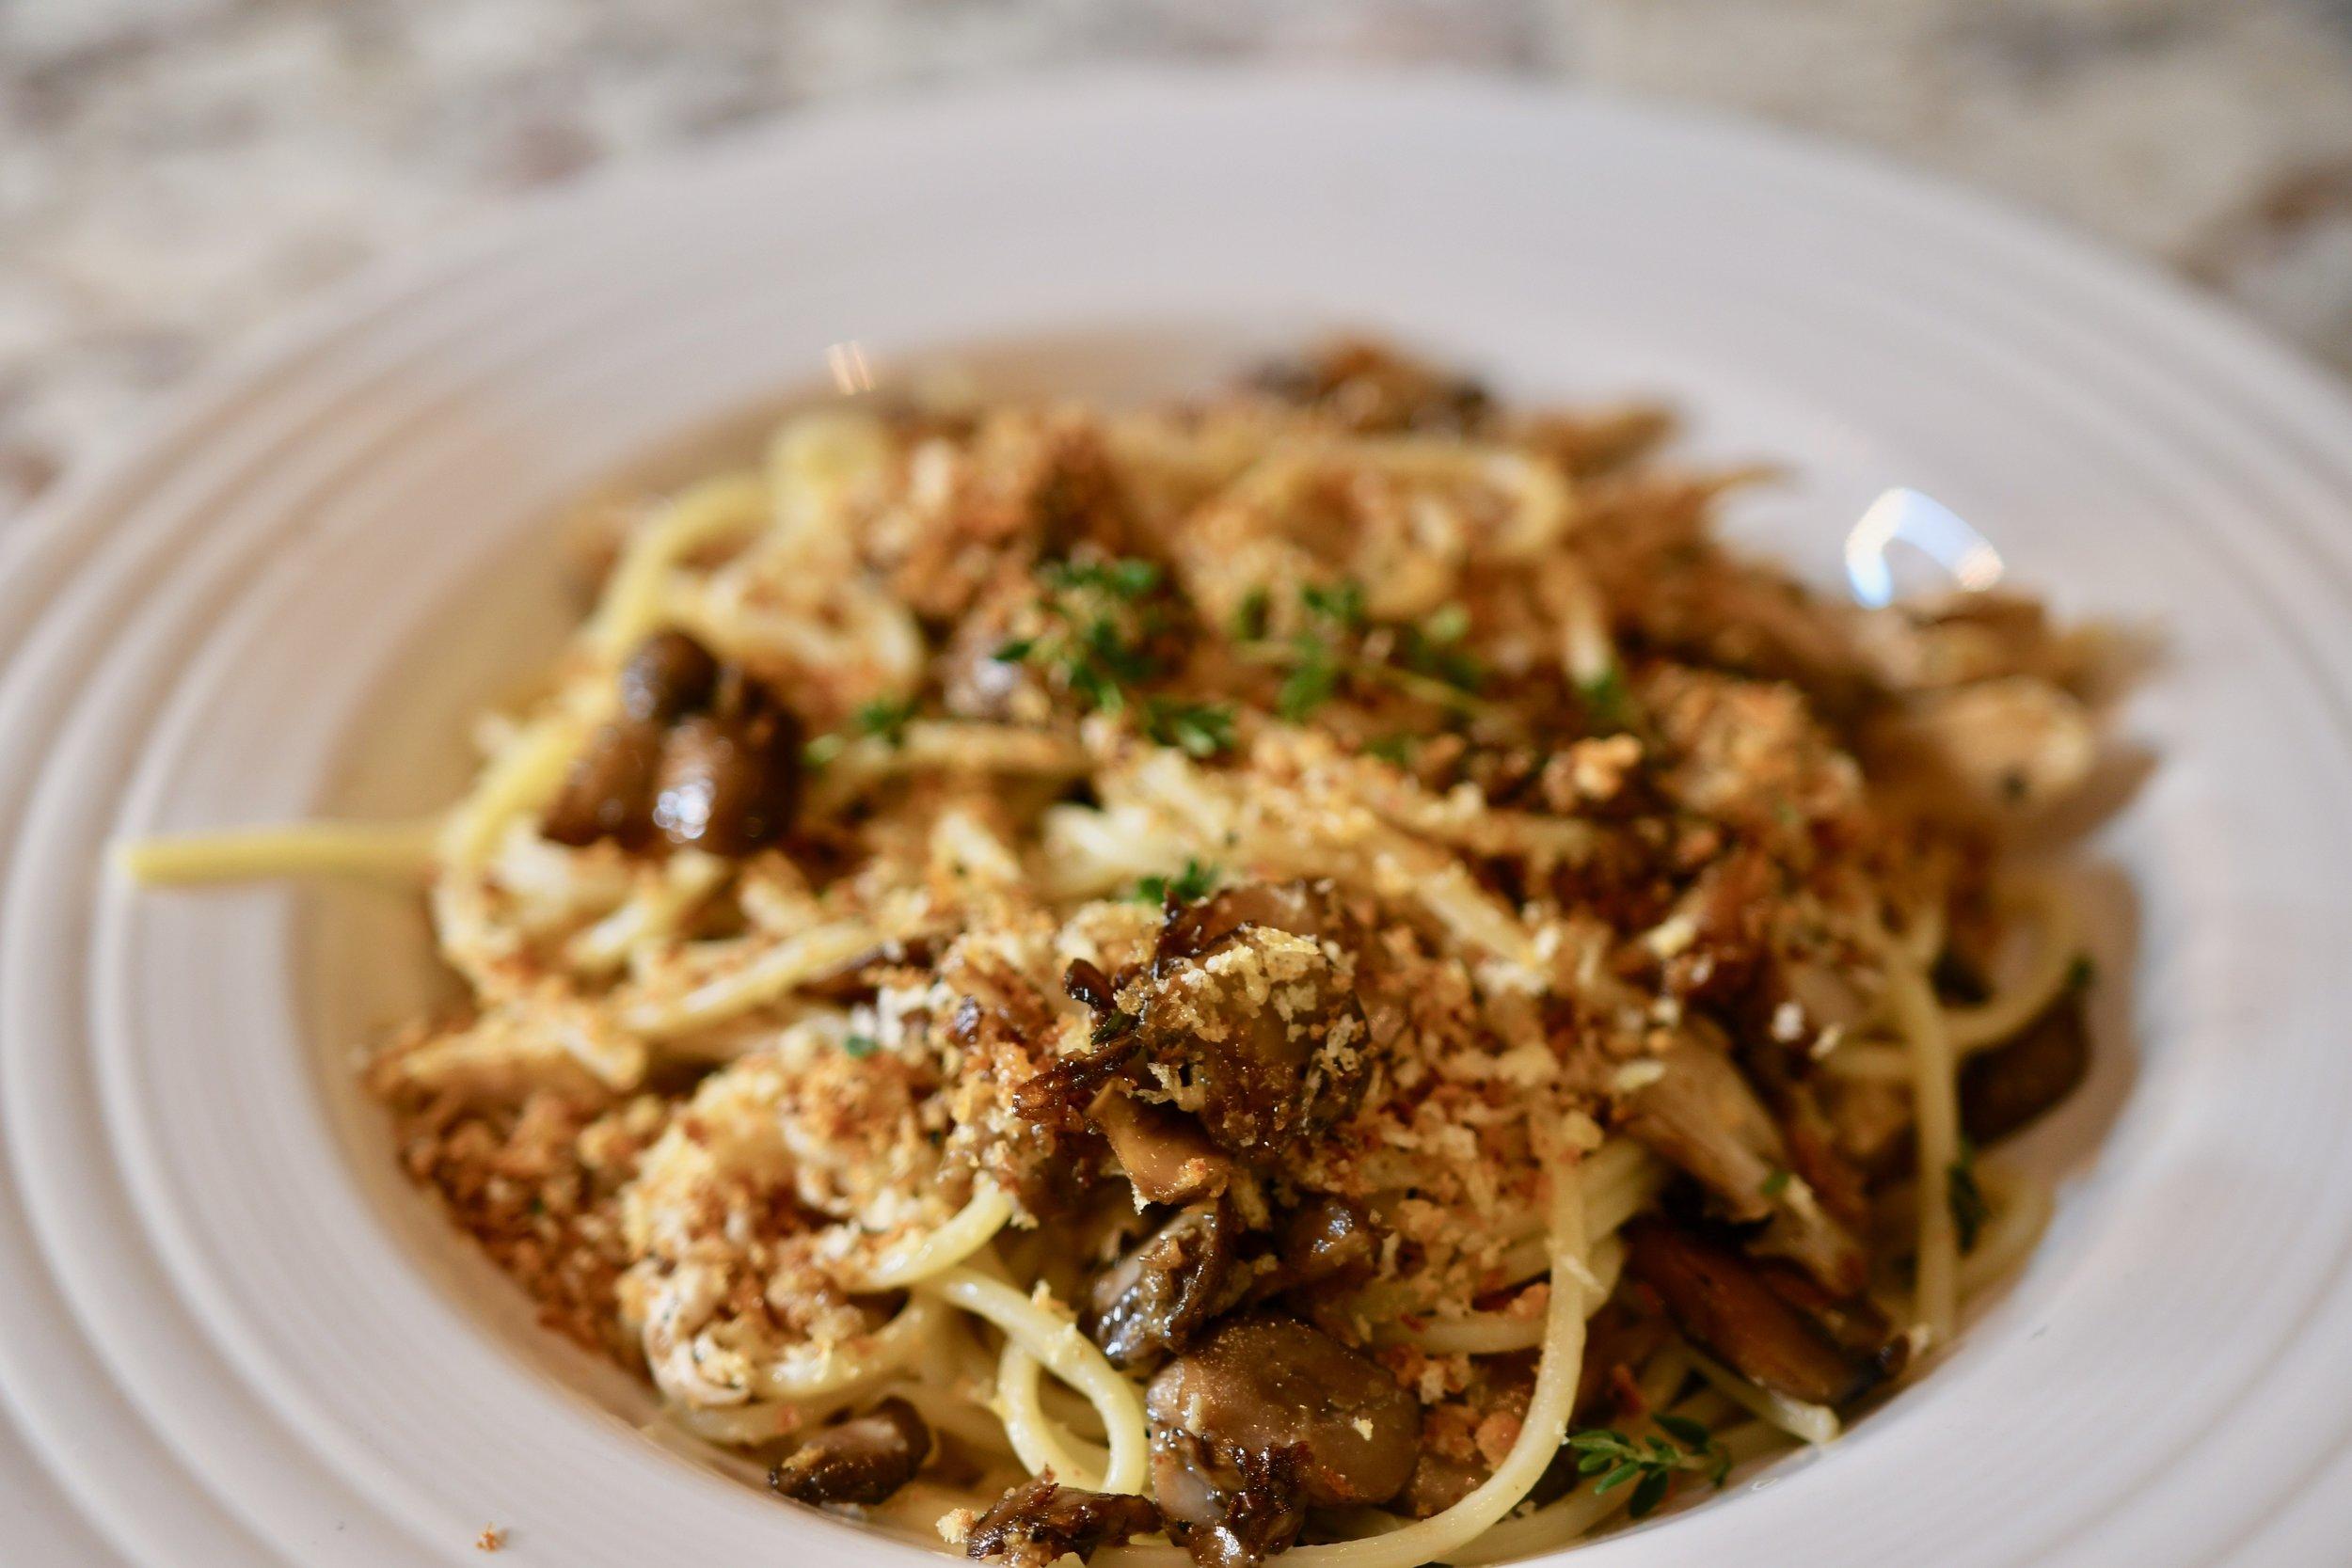 Brown Butter Mushroom & Chicken Pasta